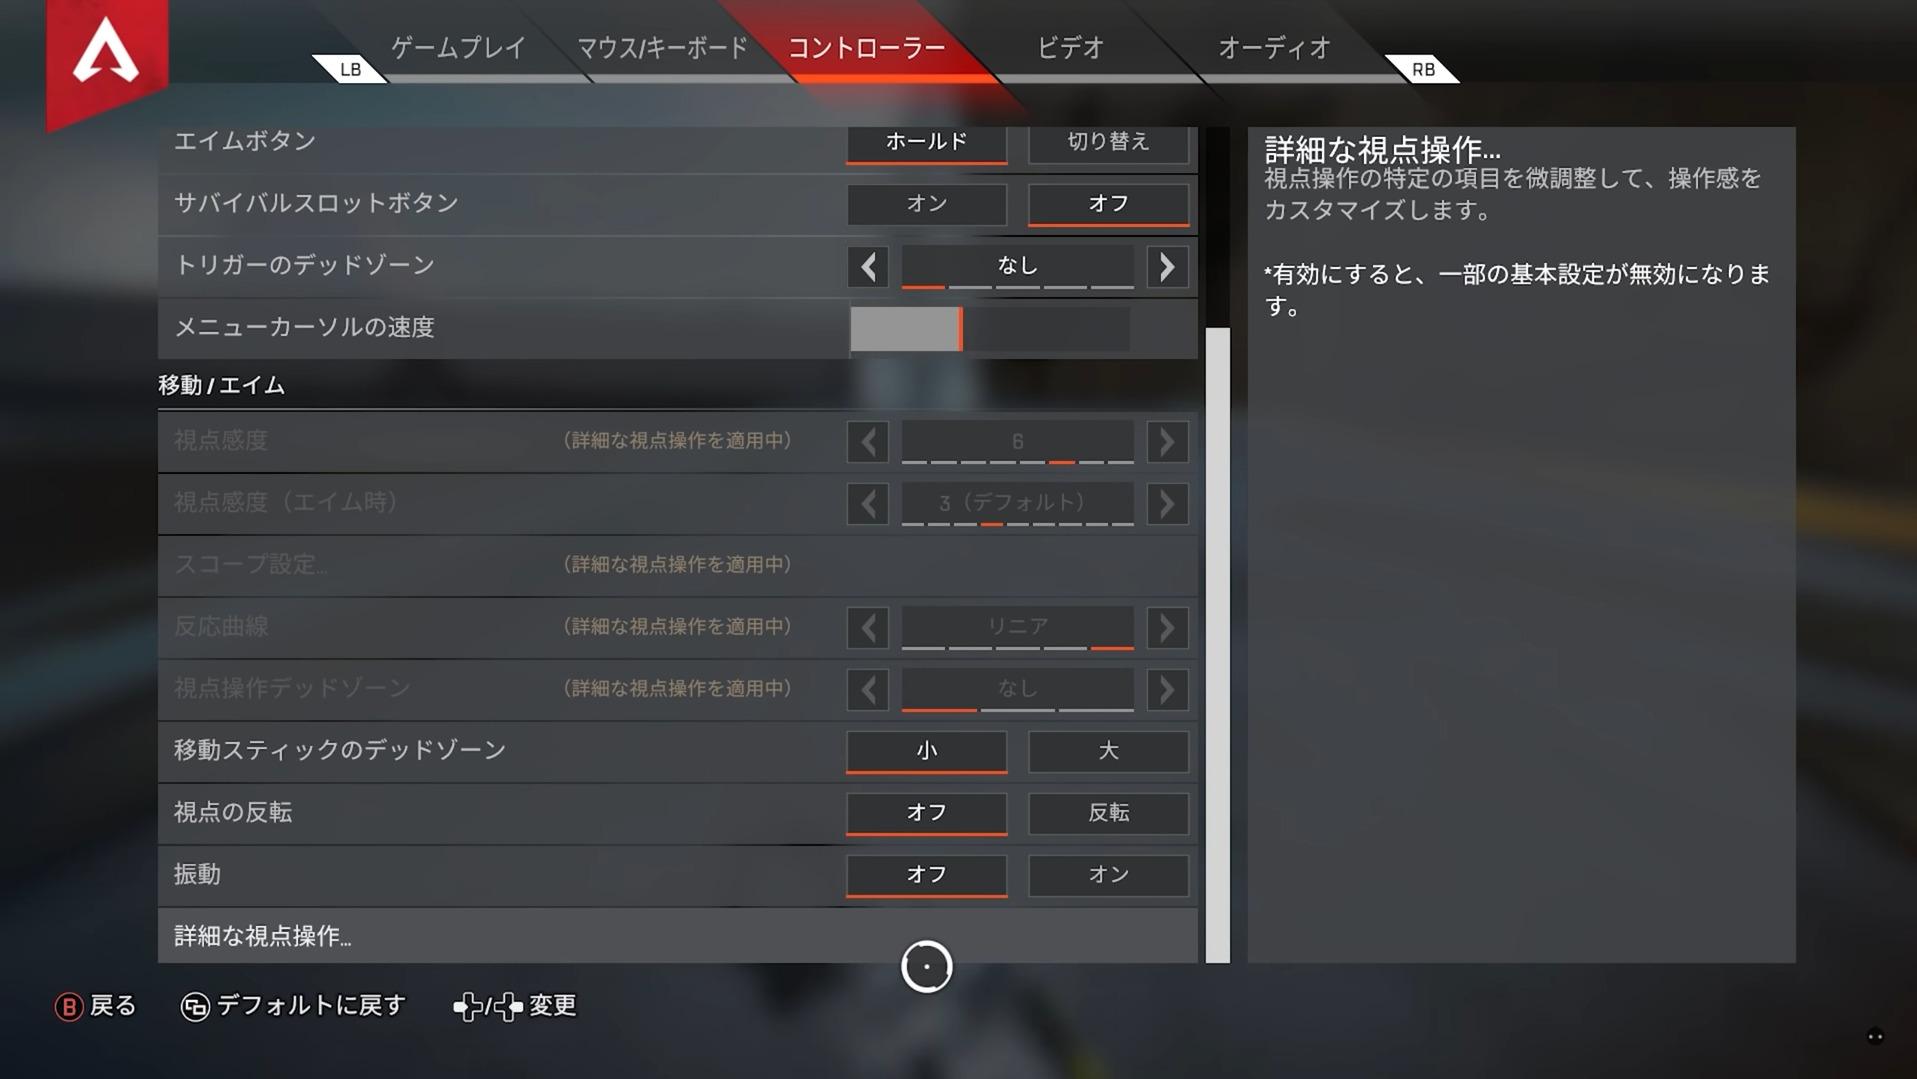 【Apex Legends】NIRU(NIRUi7) 最新のボタン配置設定・感度設定・使っている周辺機器(デバイス) まとめ【エーペックスレジェンズ】